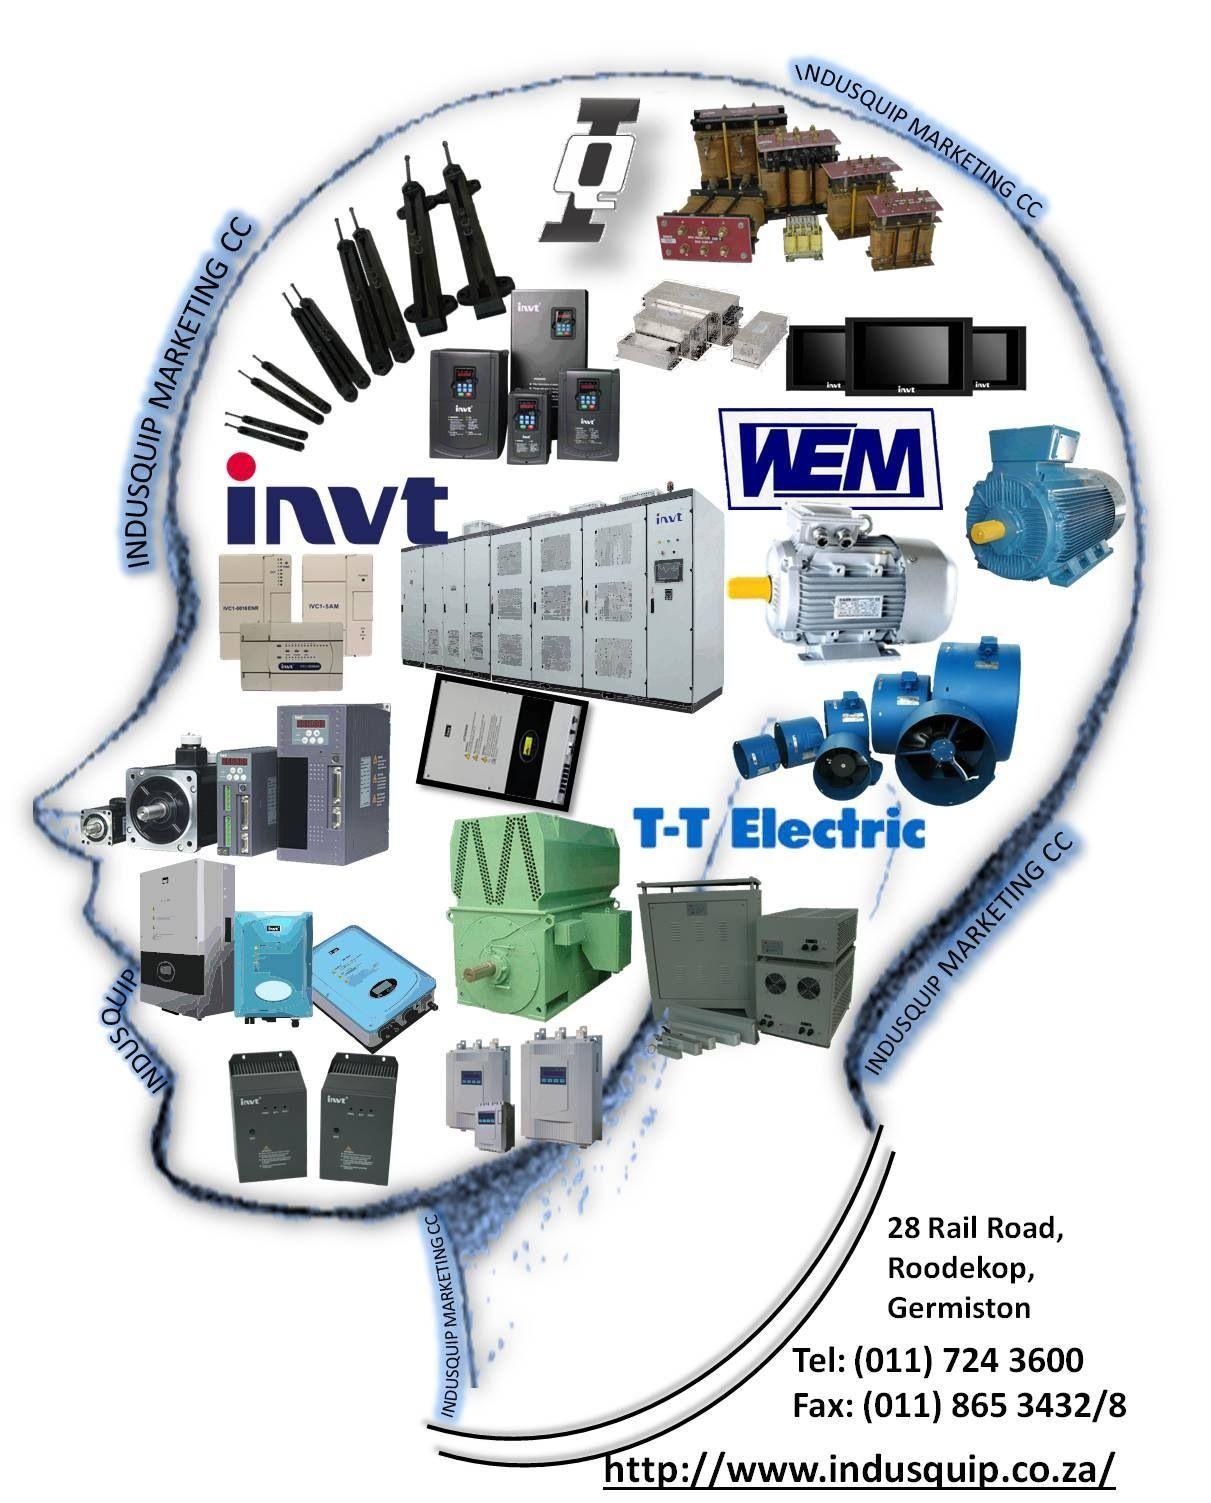 Pin by Grant Grabe on Indusquip WEM INVT Energy Saving